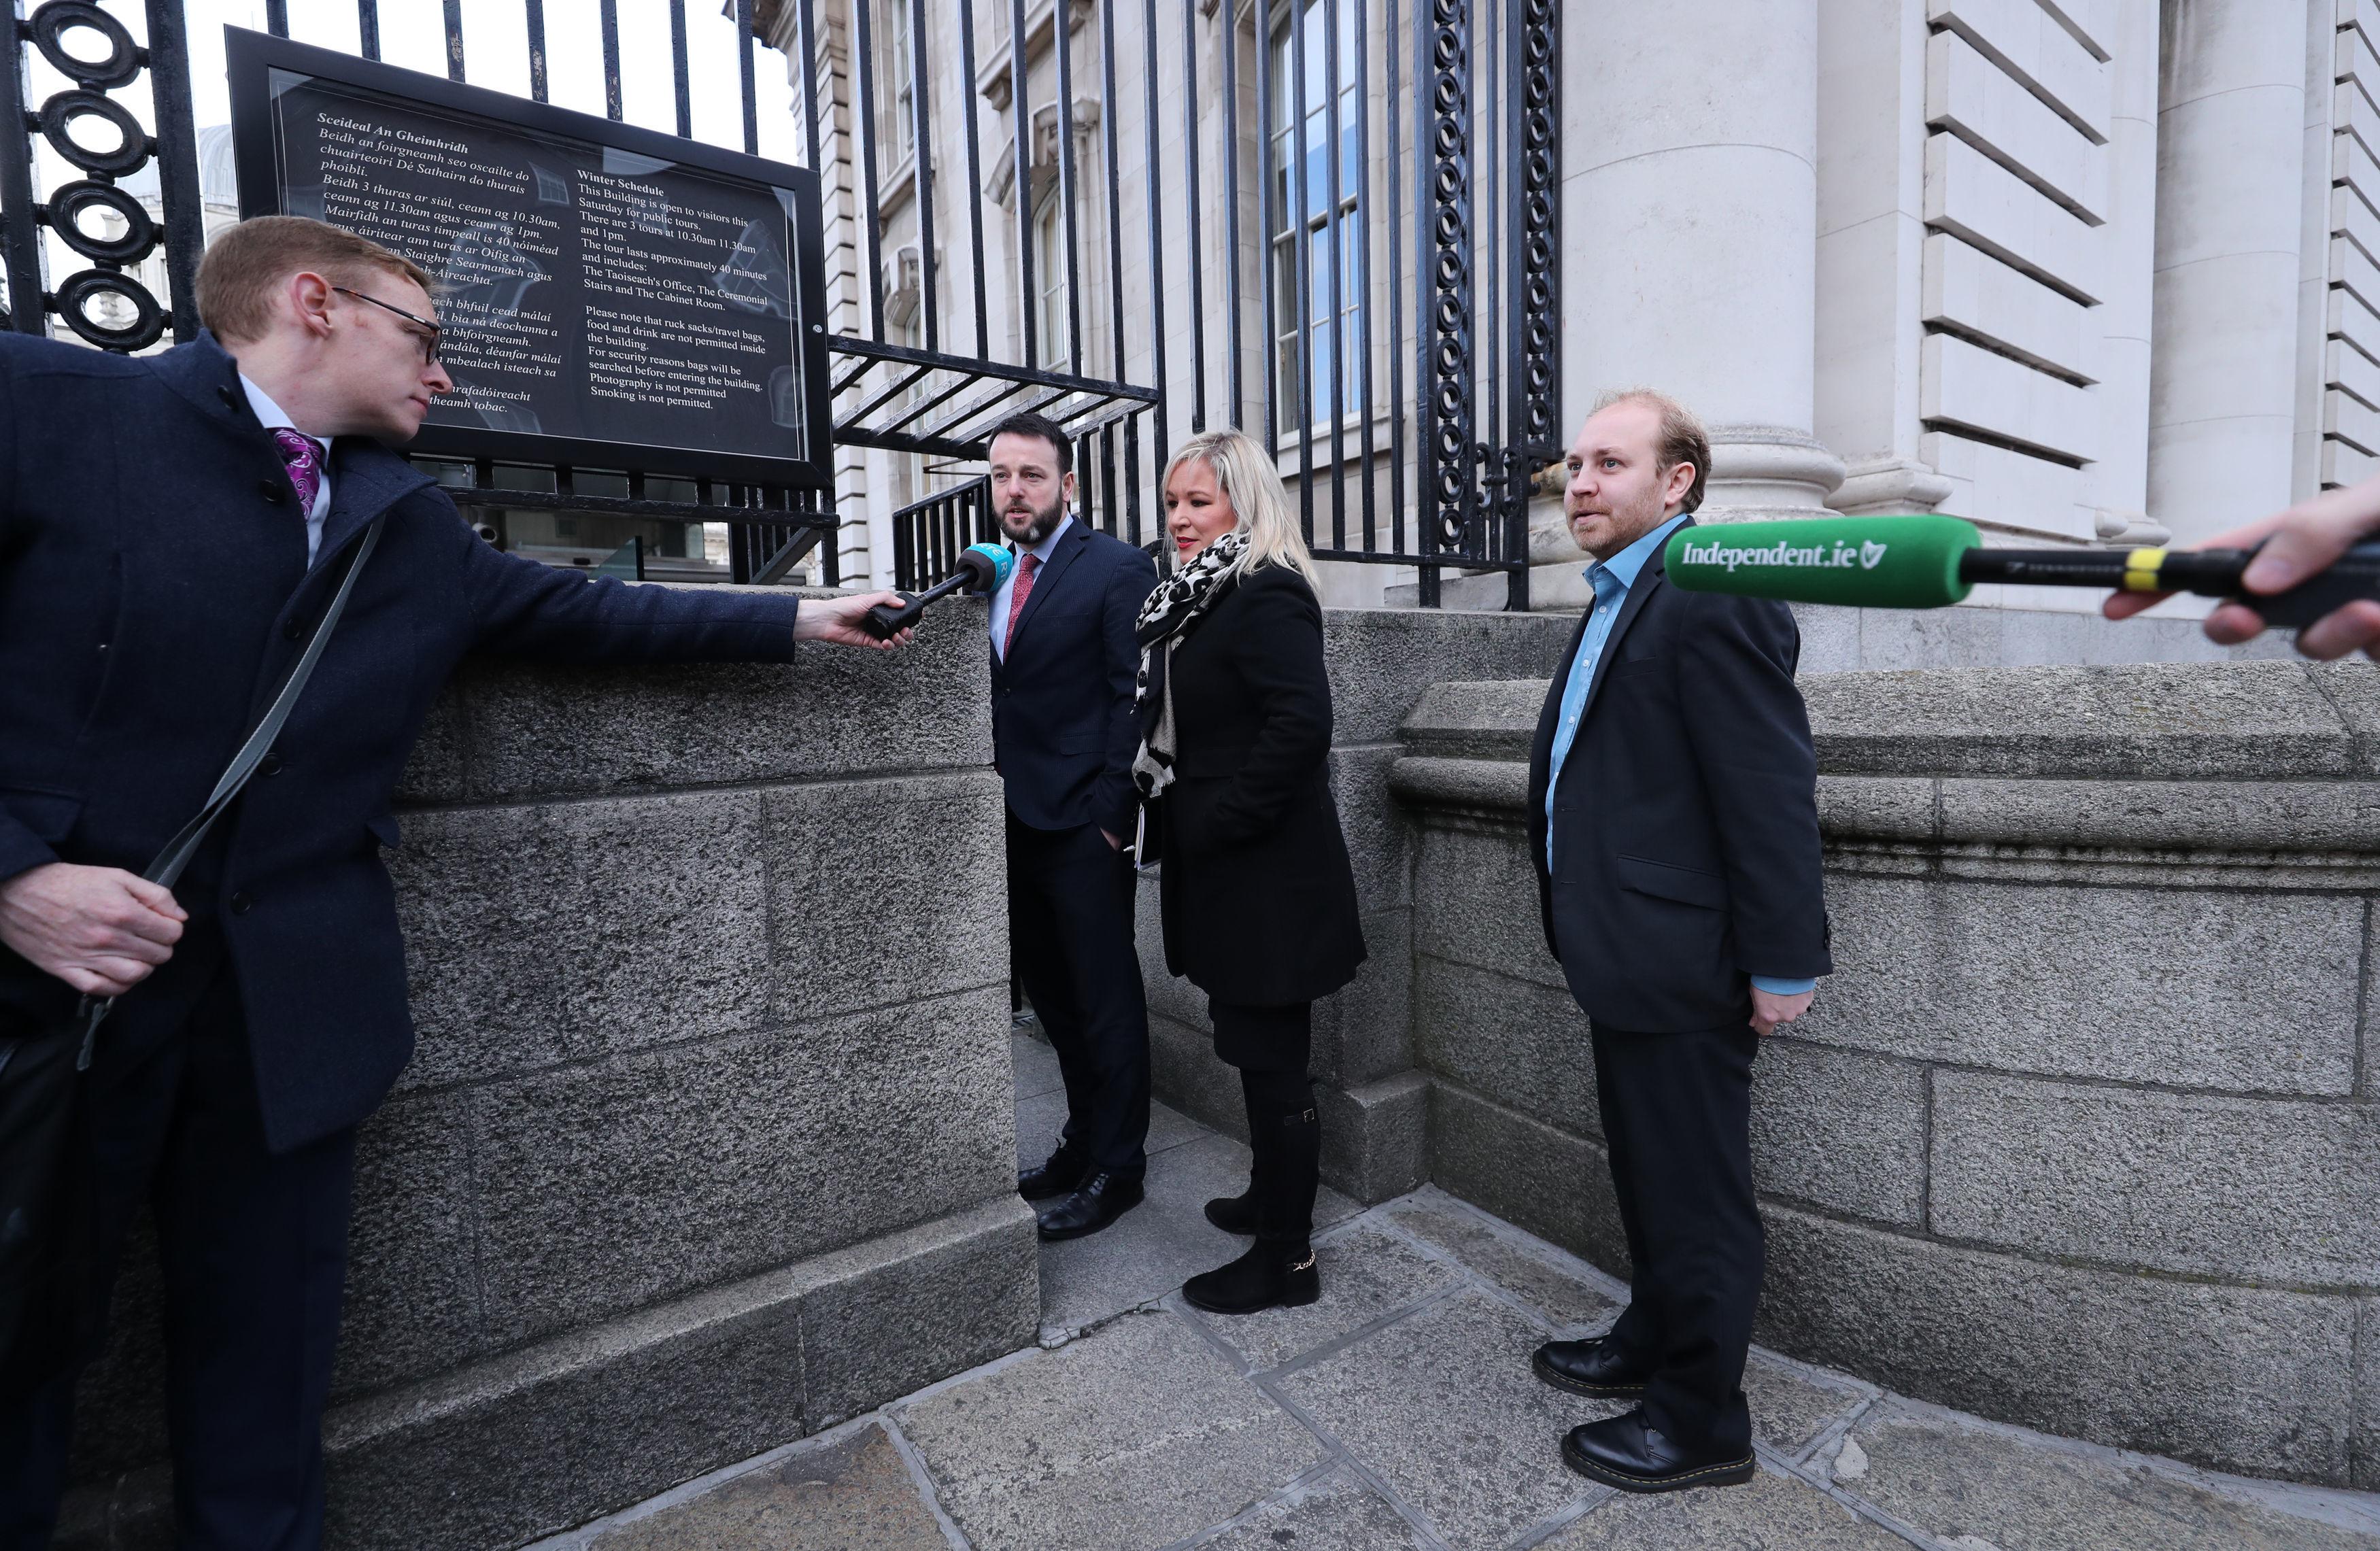 Brexit meeting in Dublin